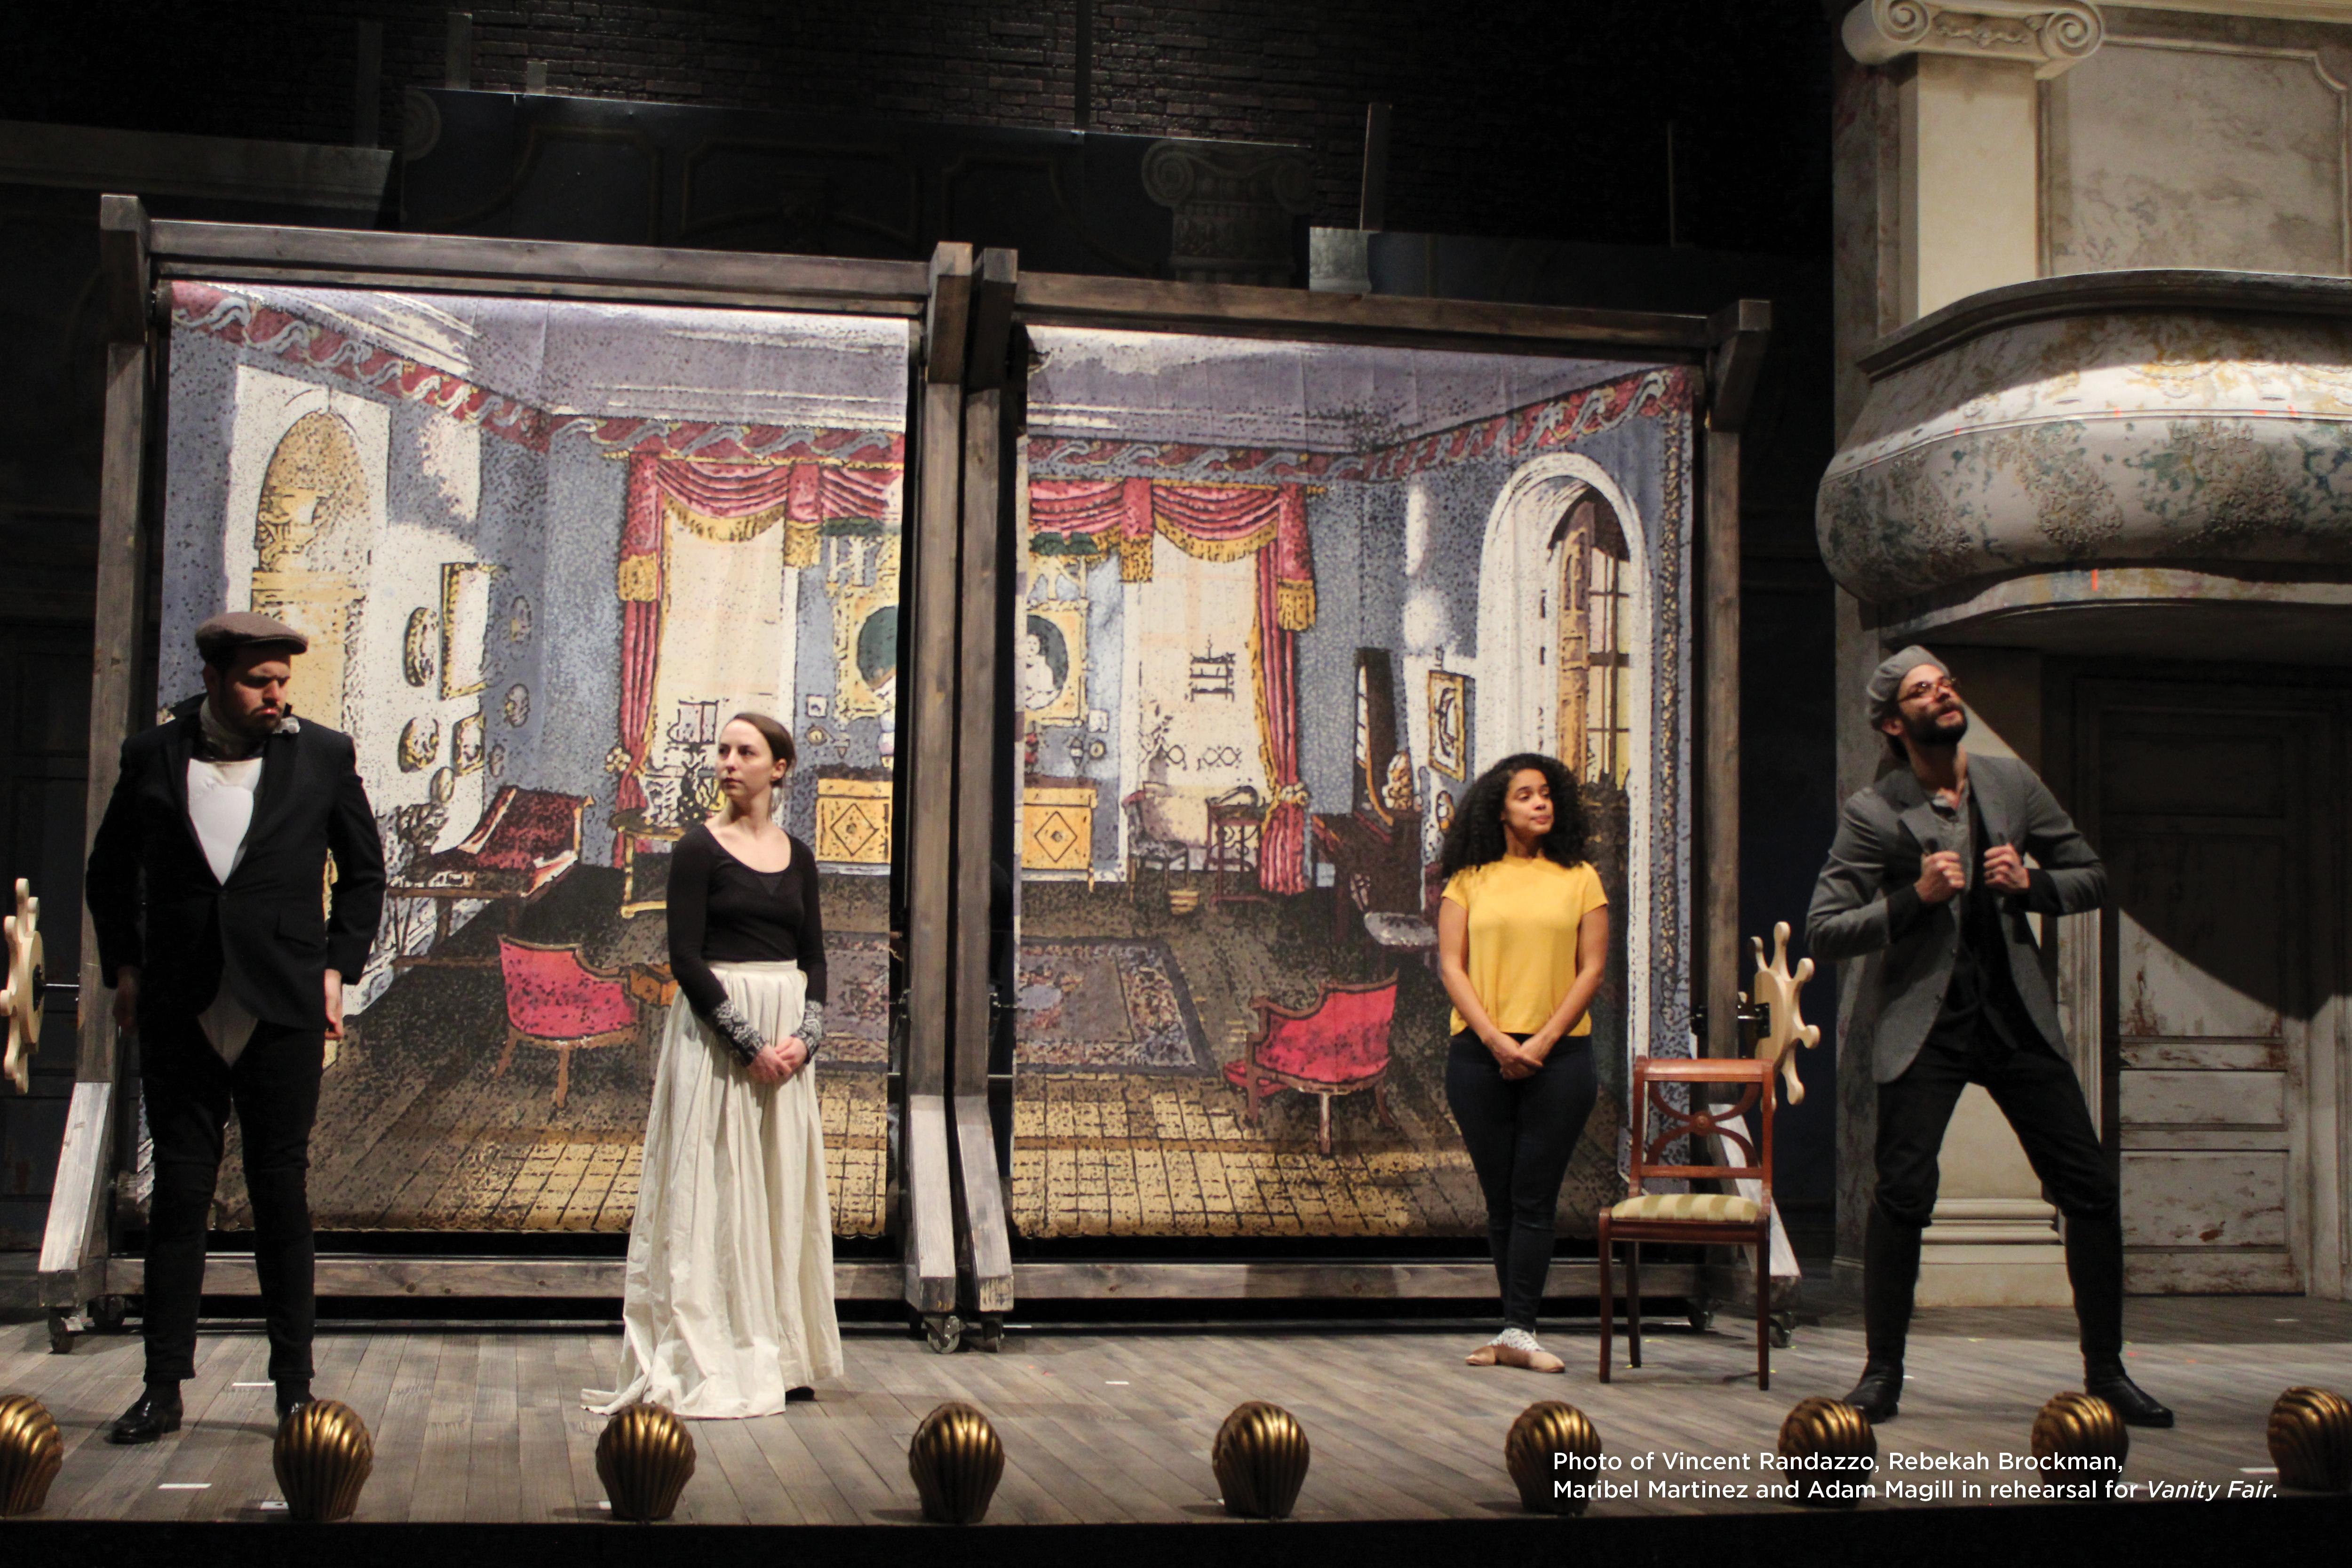 Photo of Vincent Randazzo, Rebekah Brockman, Maribel Martinez and Adam Magill in rehearsal for Vanity Fair.